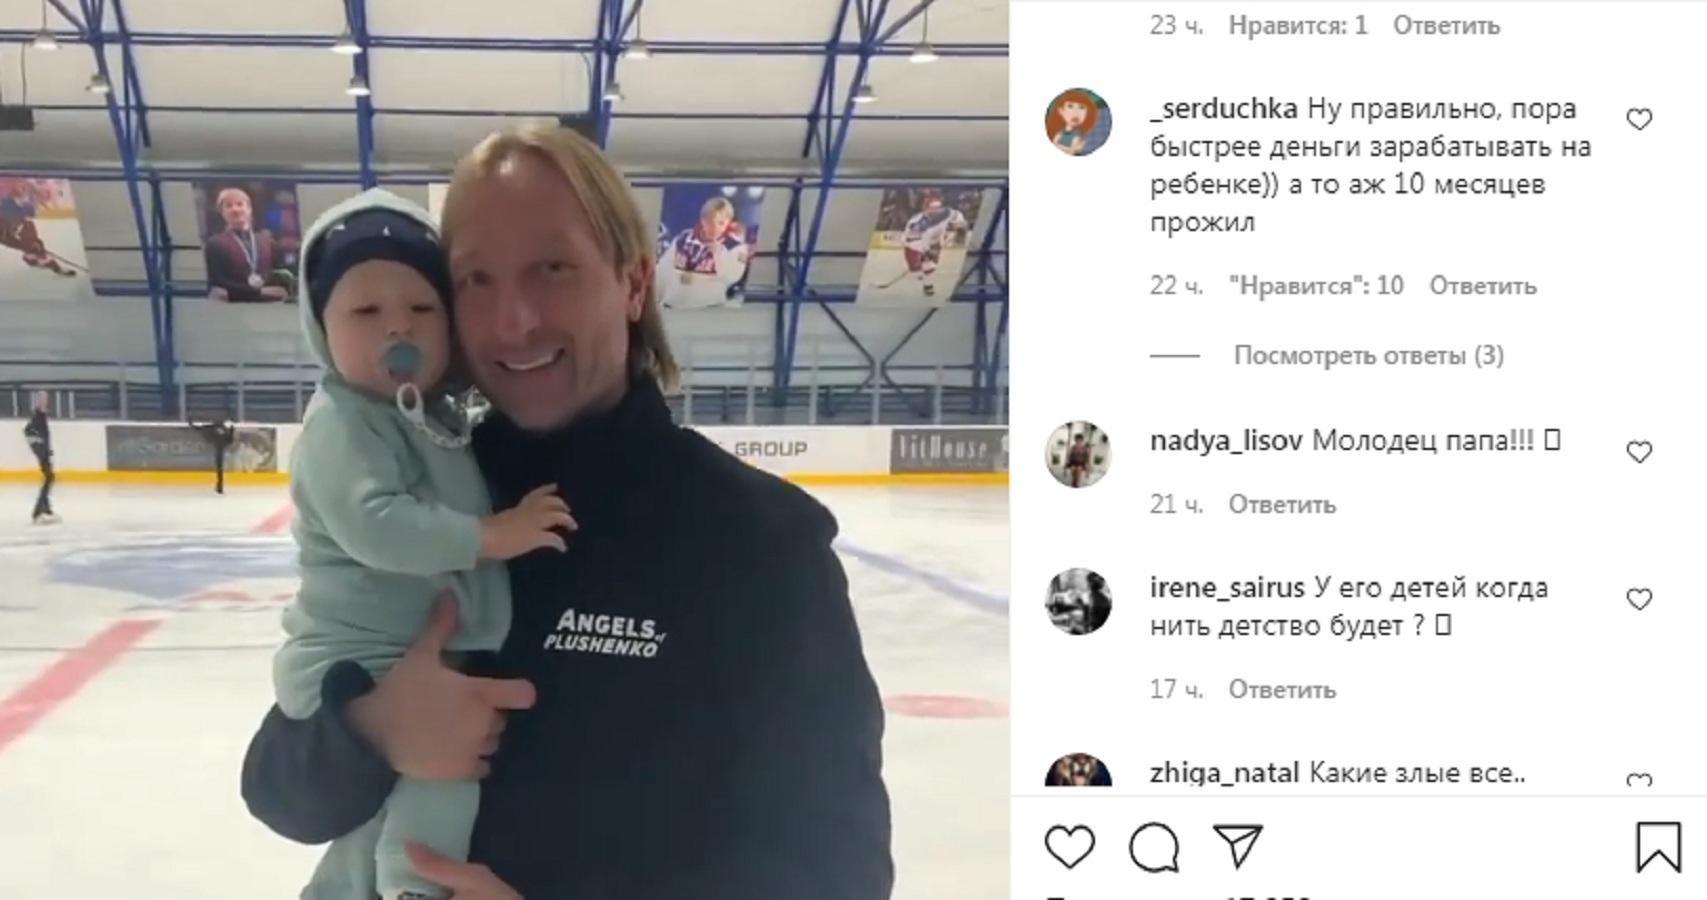 Плющенко осудили за эксплуатацию ребенка